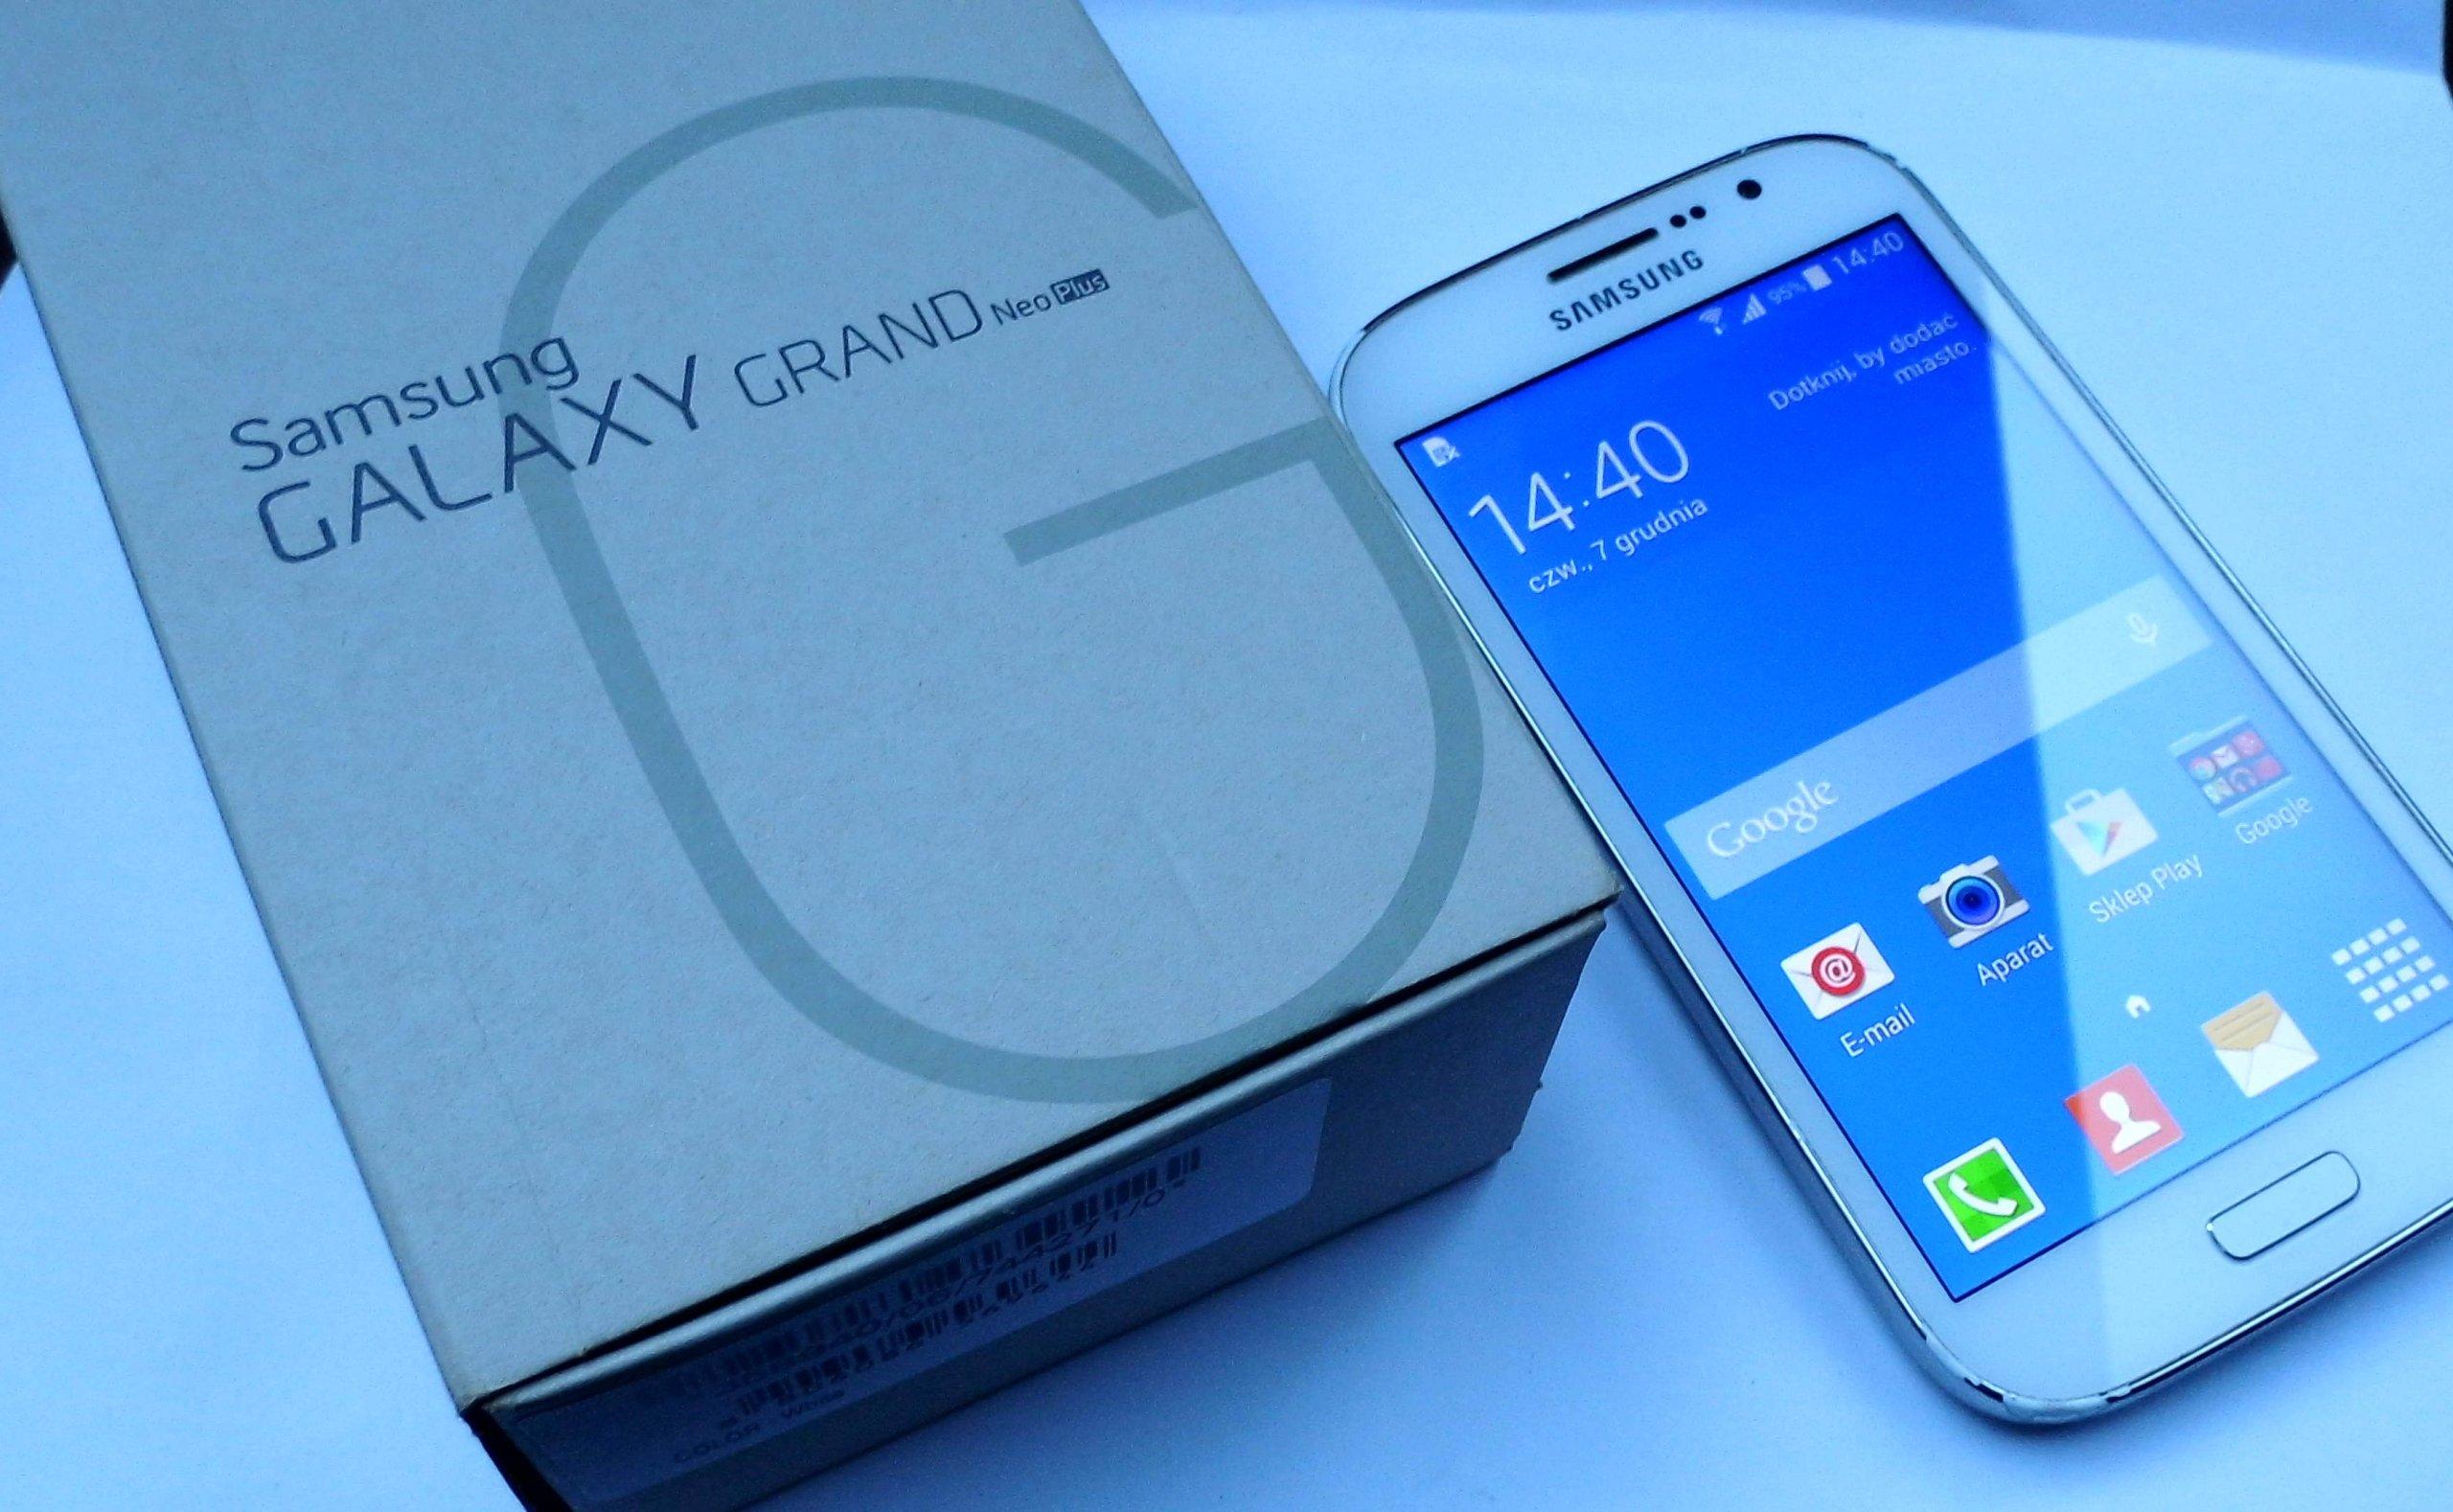 Samsung Galaxy Grand Neo Plus I9060 5 Stan Bdb 7081666264